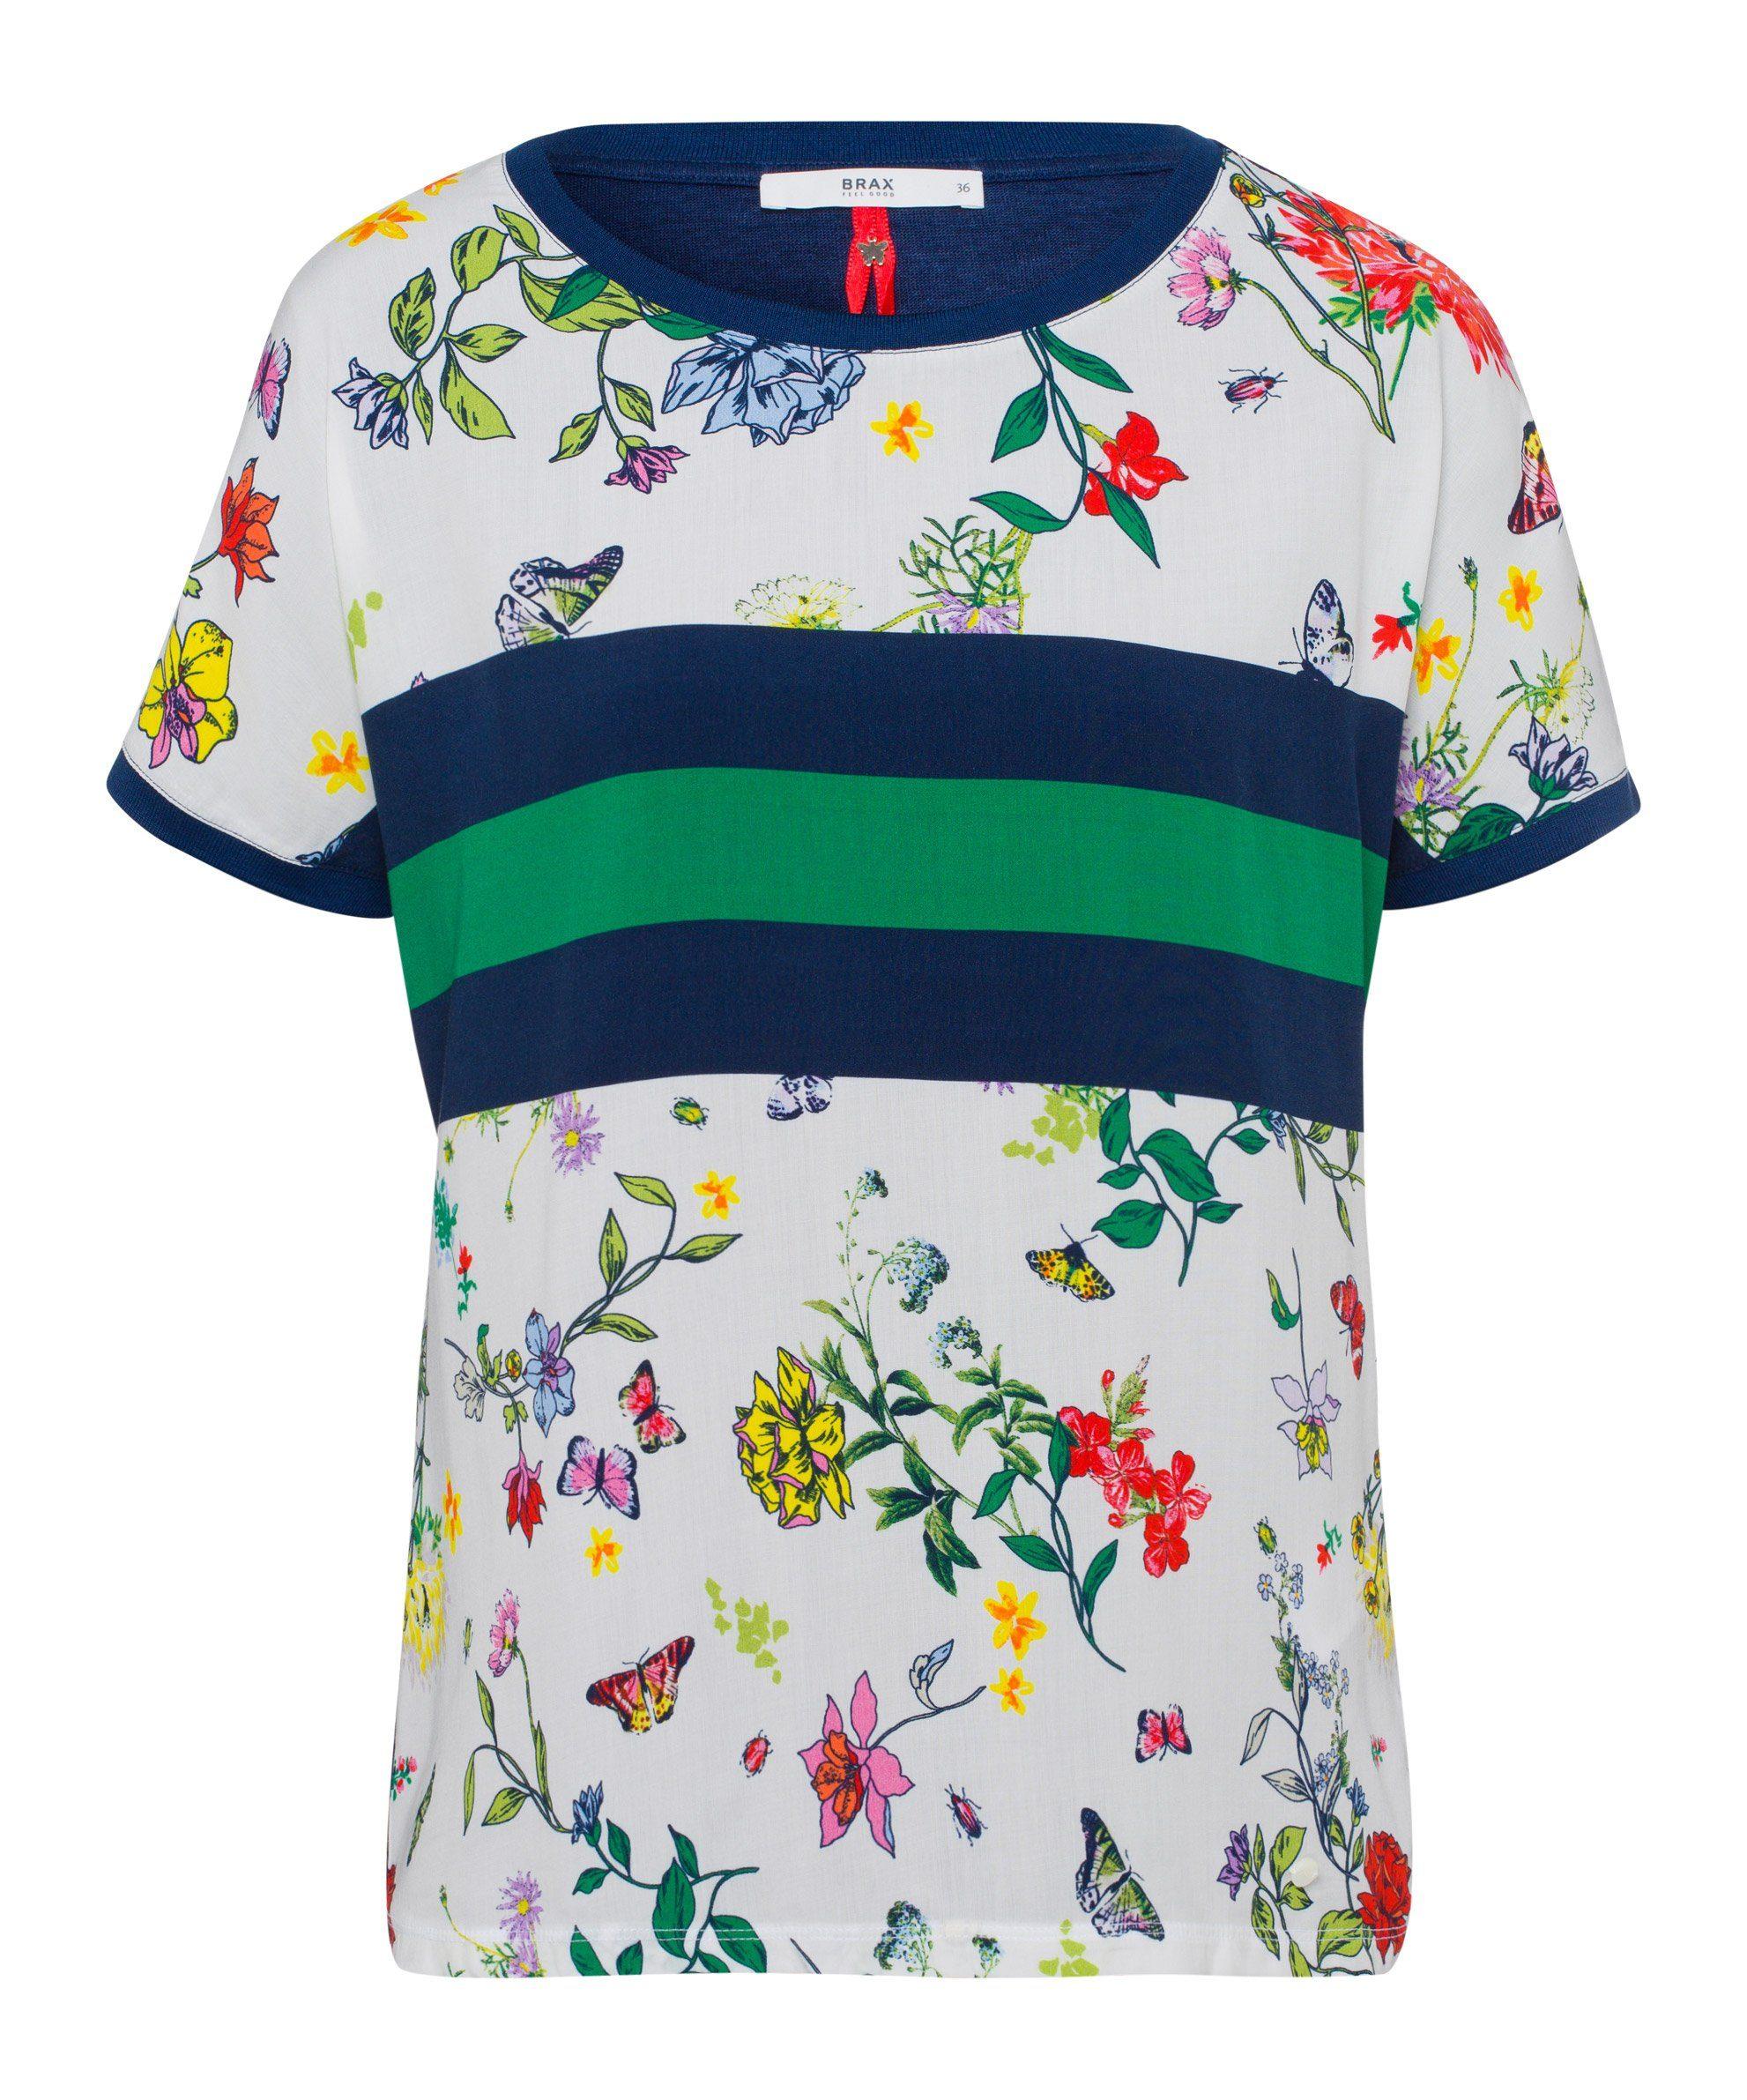 Kaufen Caelen« Online Langarmshirt Brax »style 76gvYbfyIm